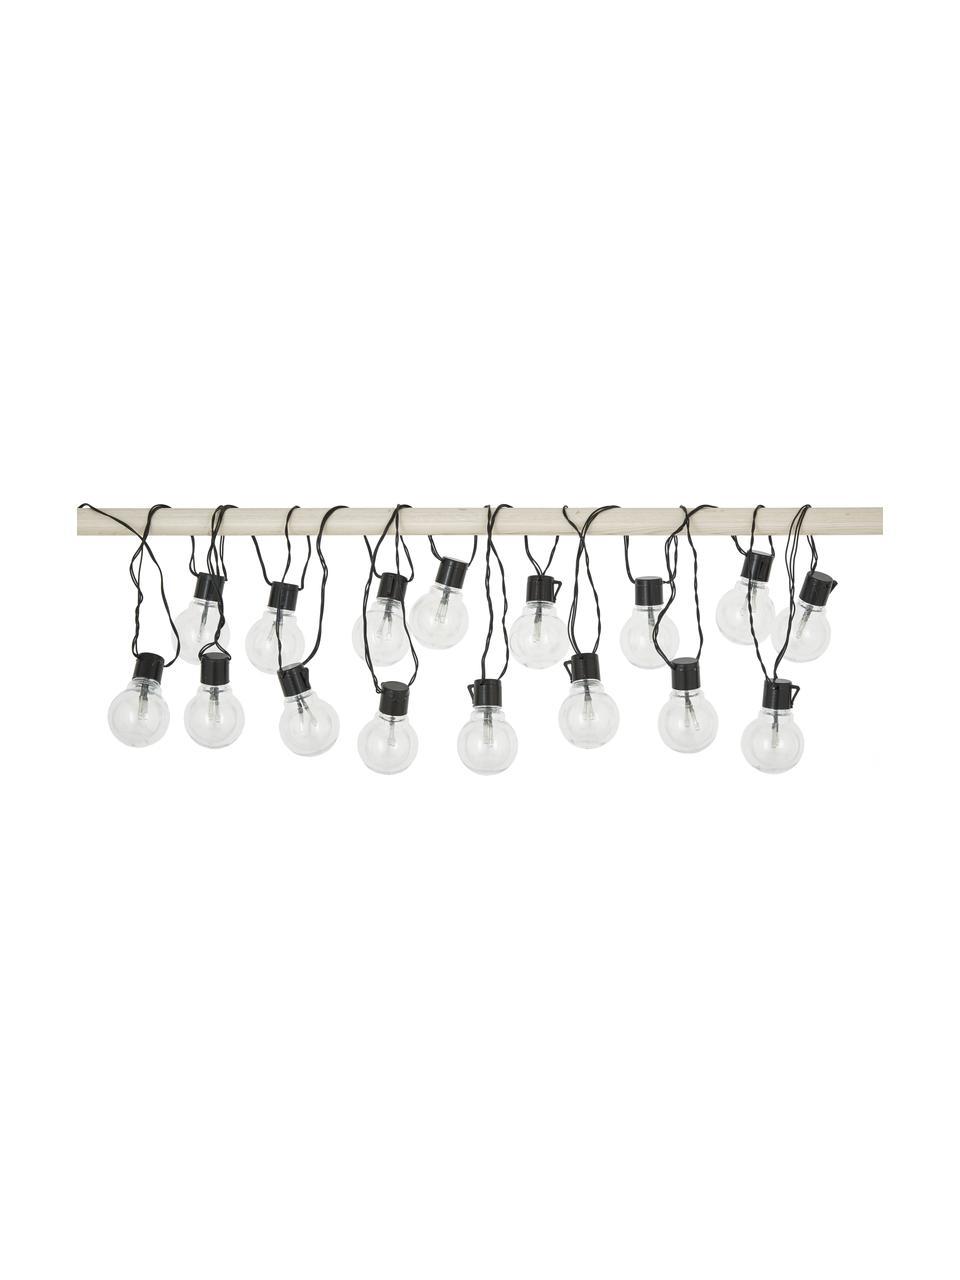 Ghirlanda a LED Partaj, 950 cm, 16 lampioni, Nero, Lung. 500 cm